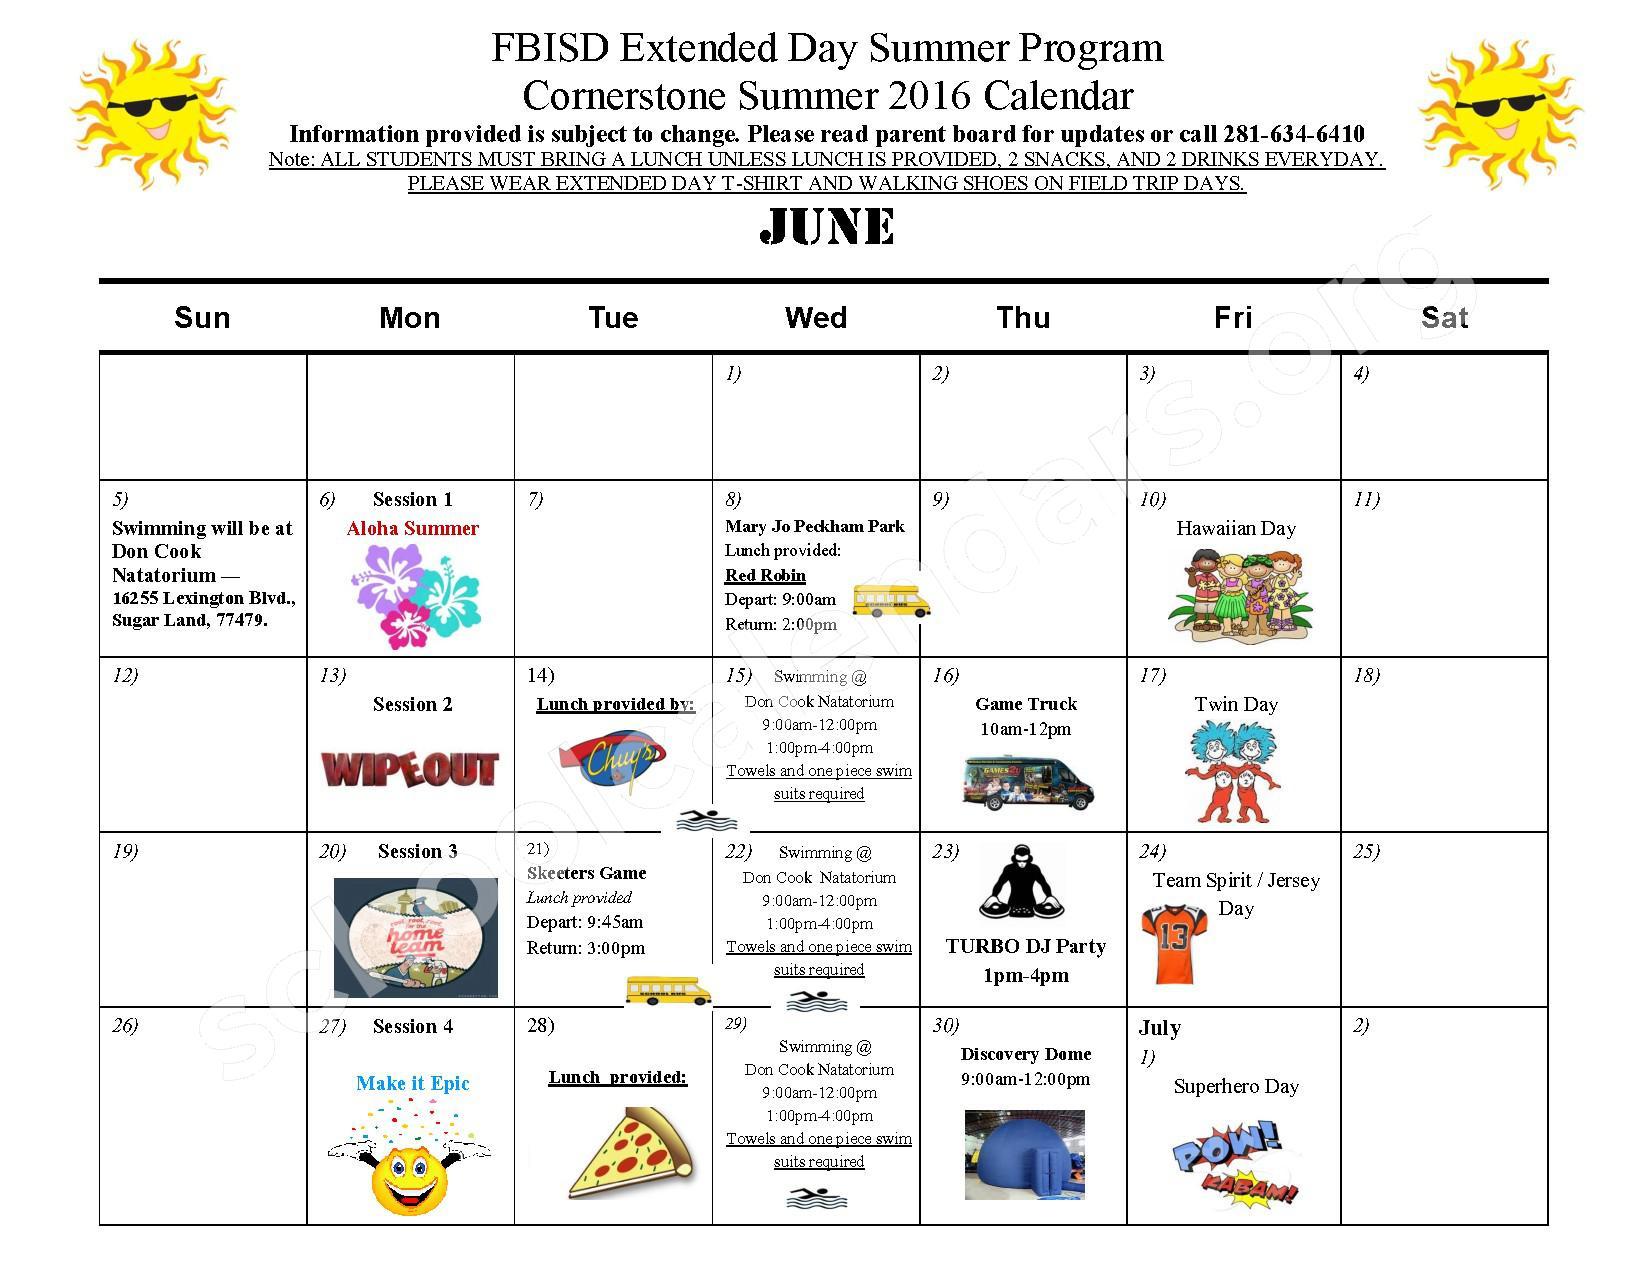 Summer 2016 Cornerstone Elementary Calendar – Cornerstone Elementary School – page 1